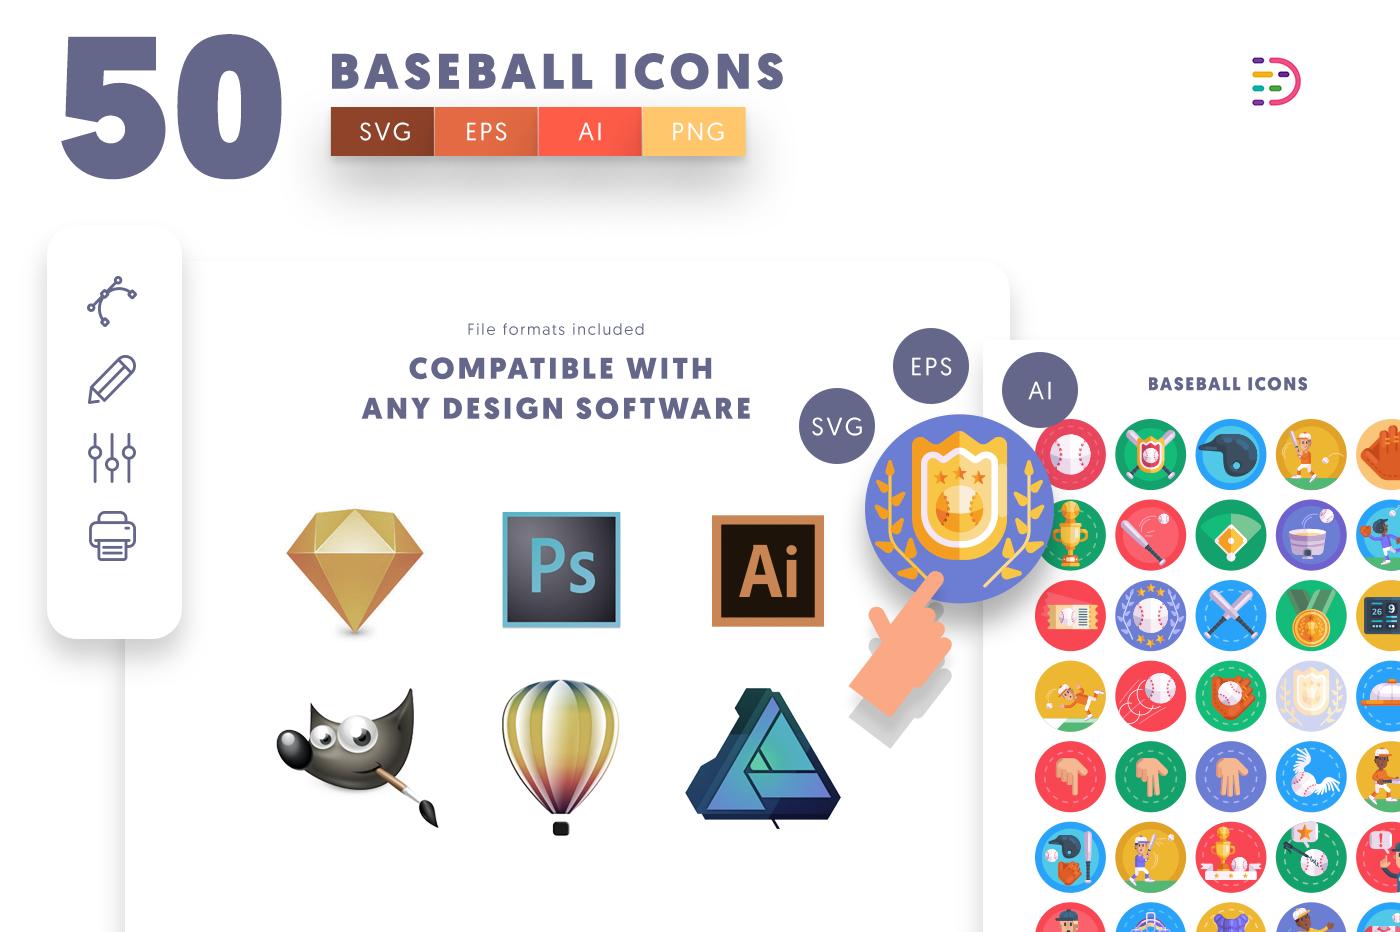 full vector 50 Baseball Icons EPS, SVG, PNG